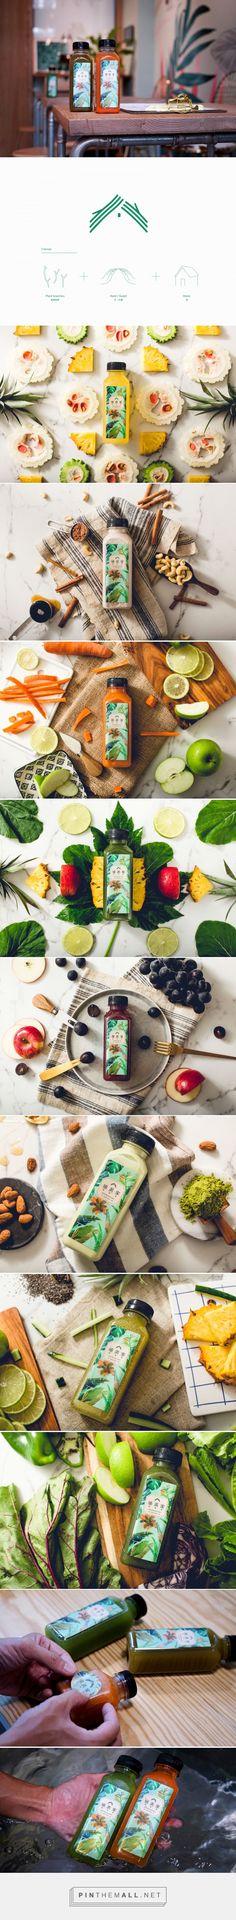 UEMIYA Cold Pressed Juice packaging design by Nio Ni - http://www.packagingoftheworld.com/2017/10/uemiya-cold-pressed-juice.html